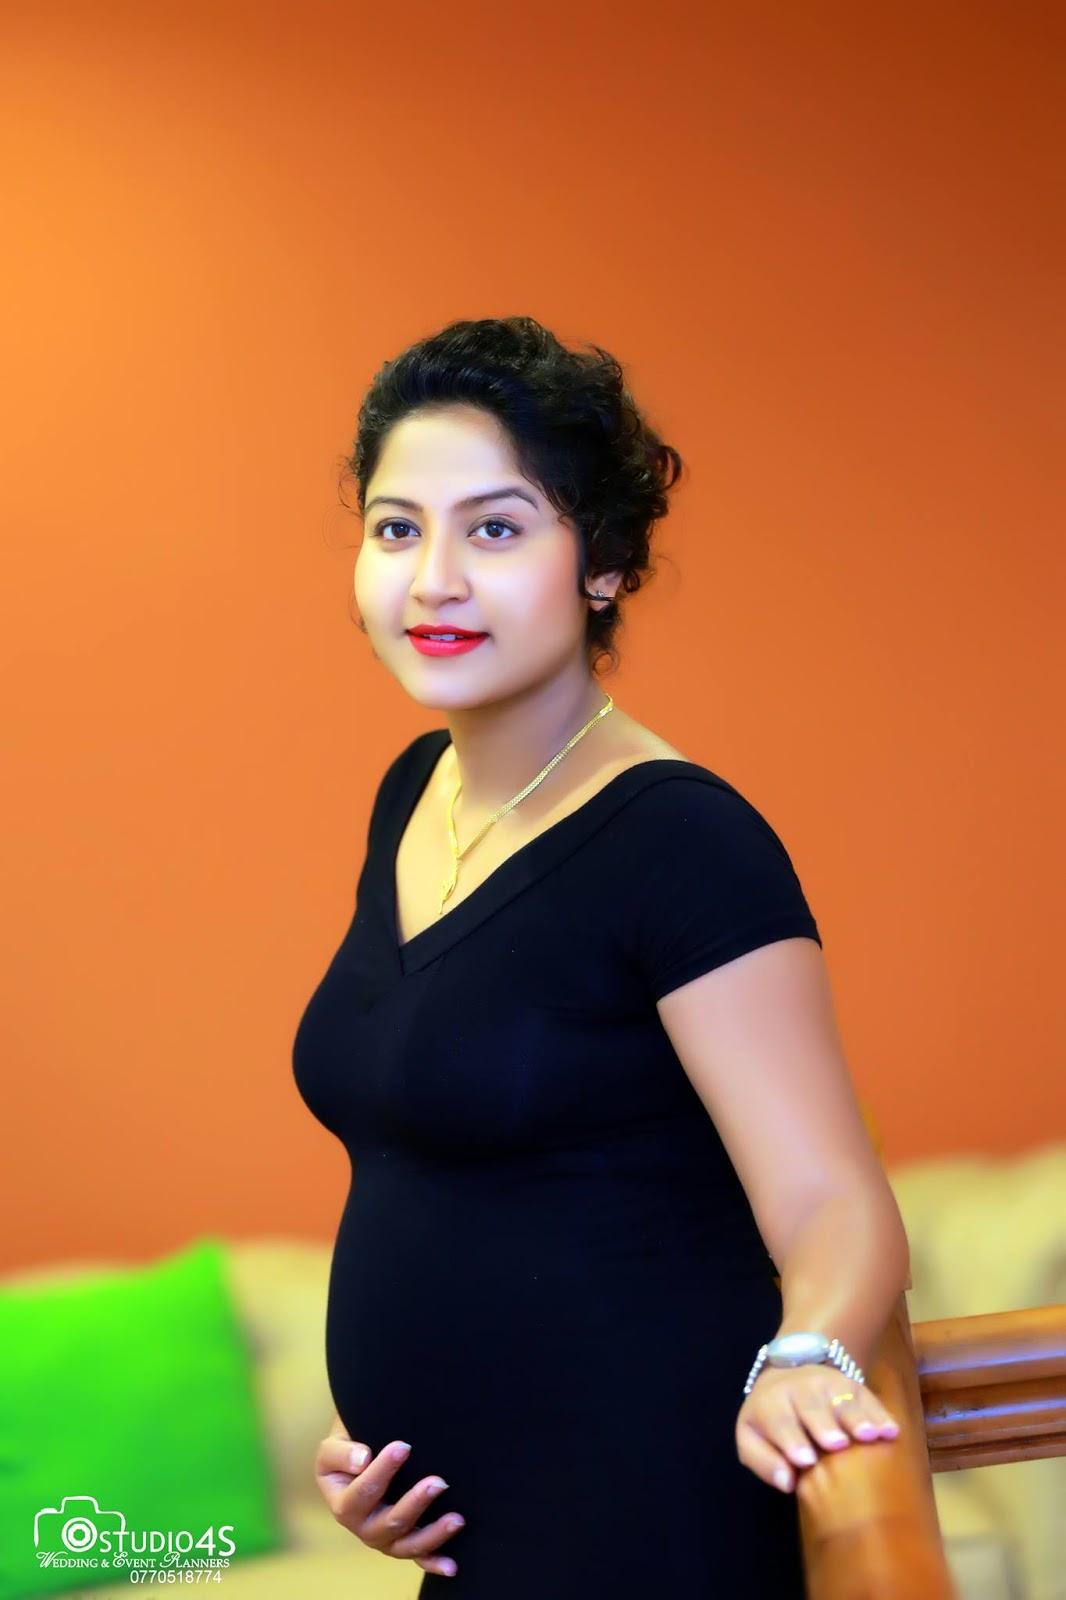 image Sri lankan pregnant 6 months shaved